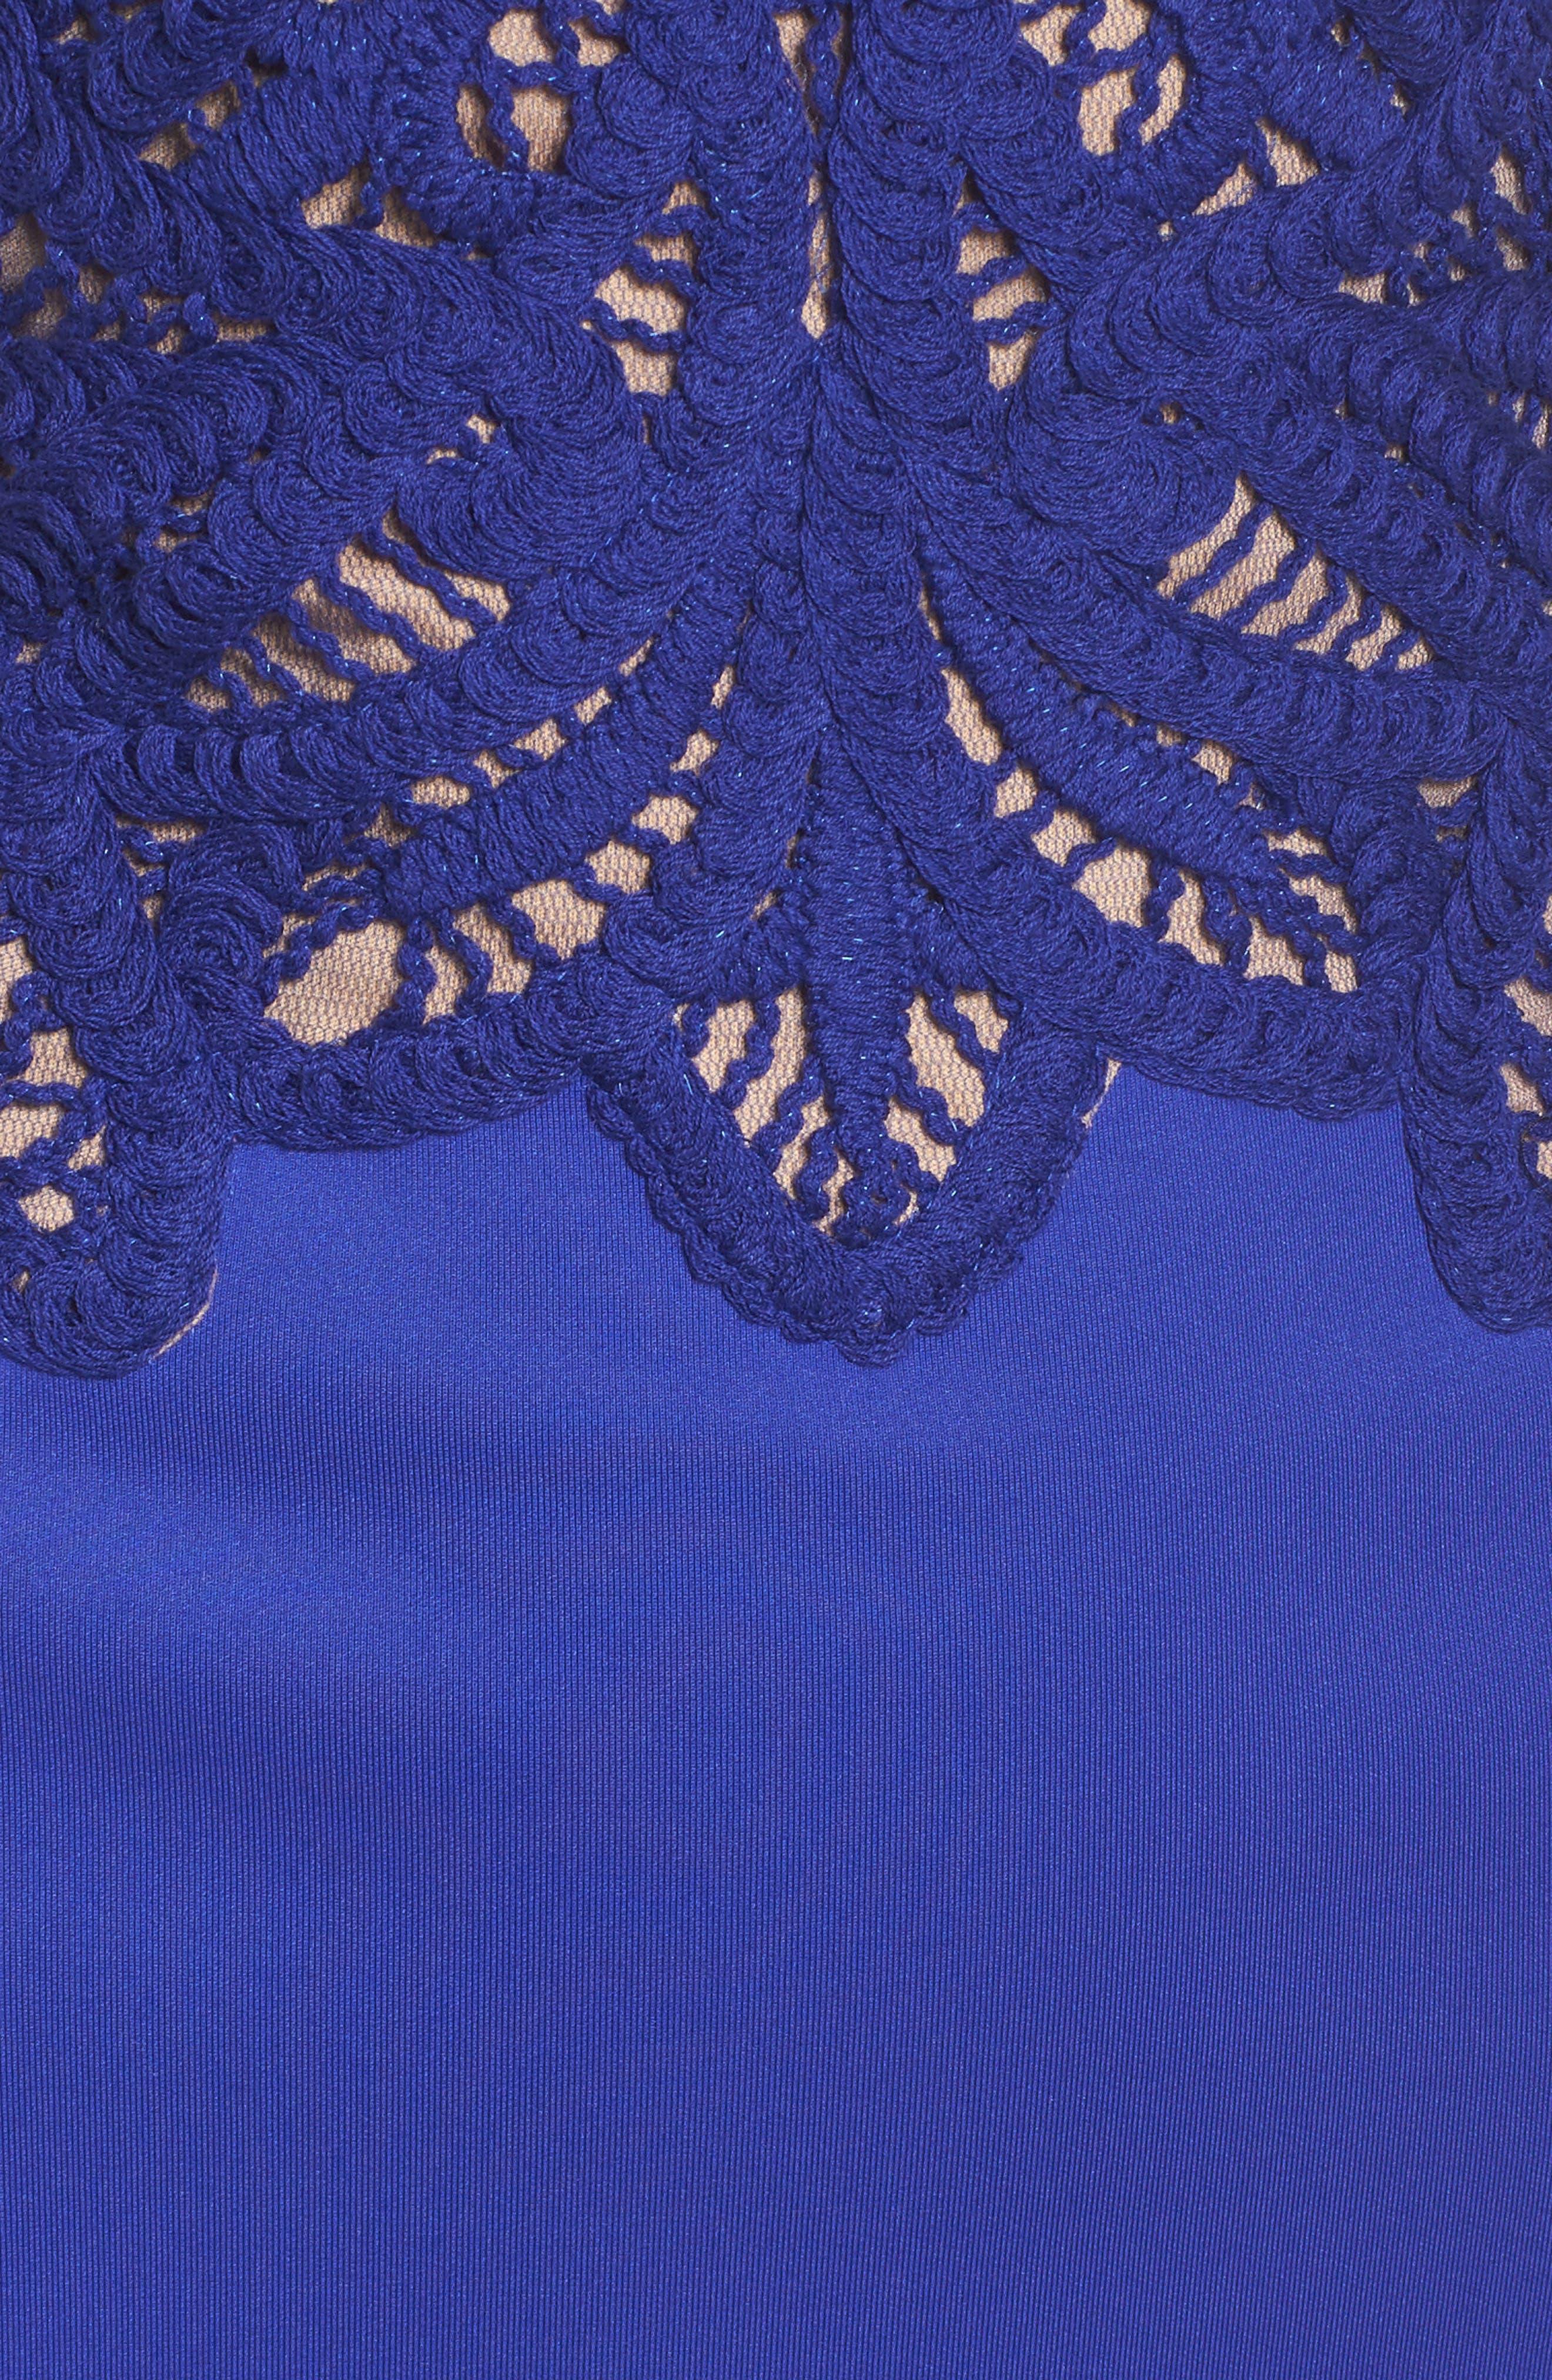 Crochet & Crepe Sheath Dress,                             Alternate thumbnail 5, color,                             404